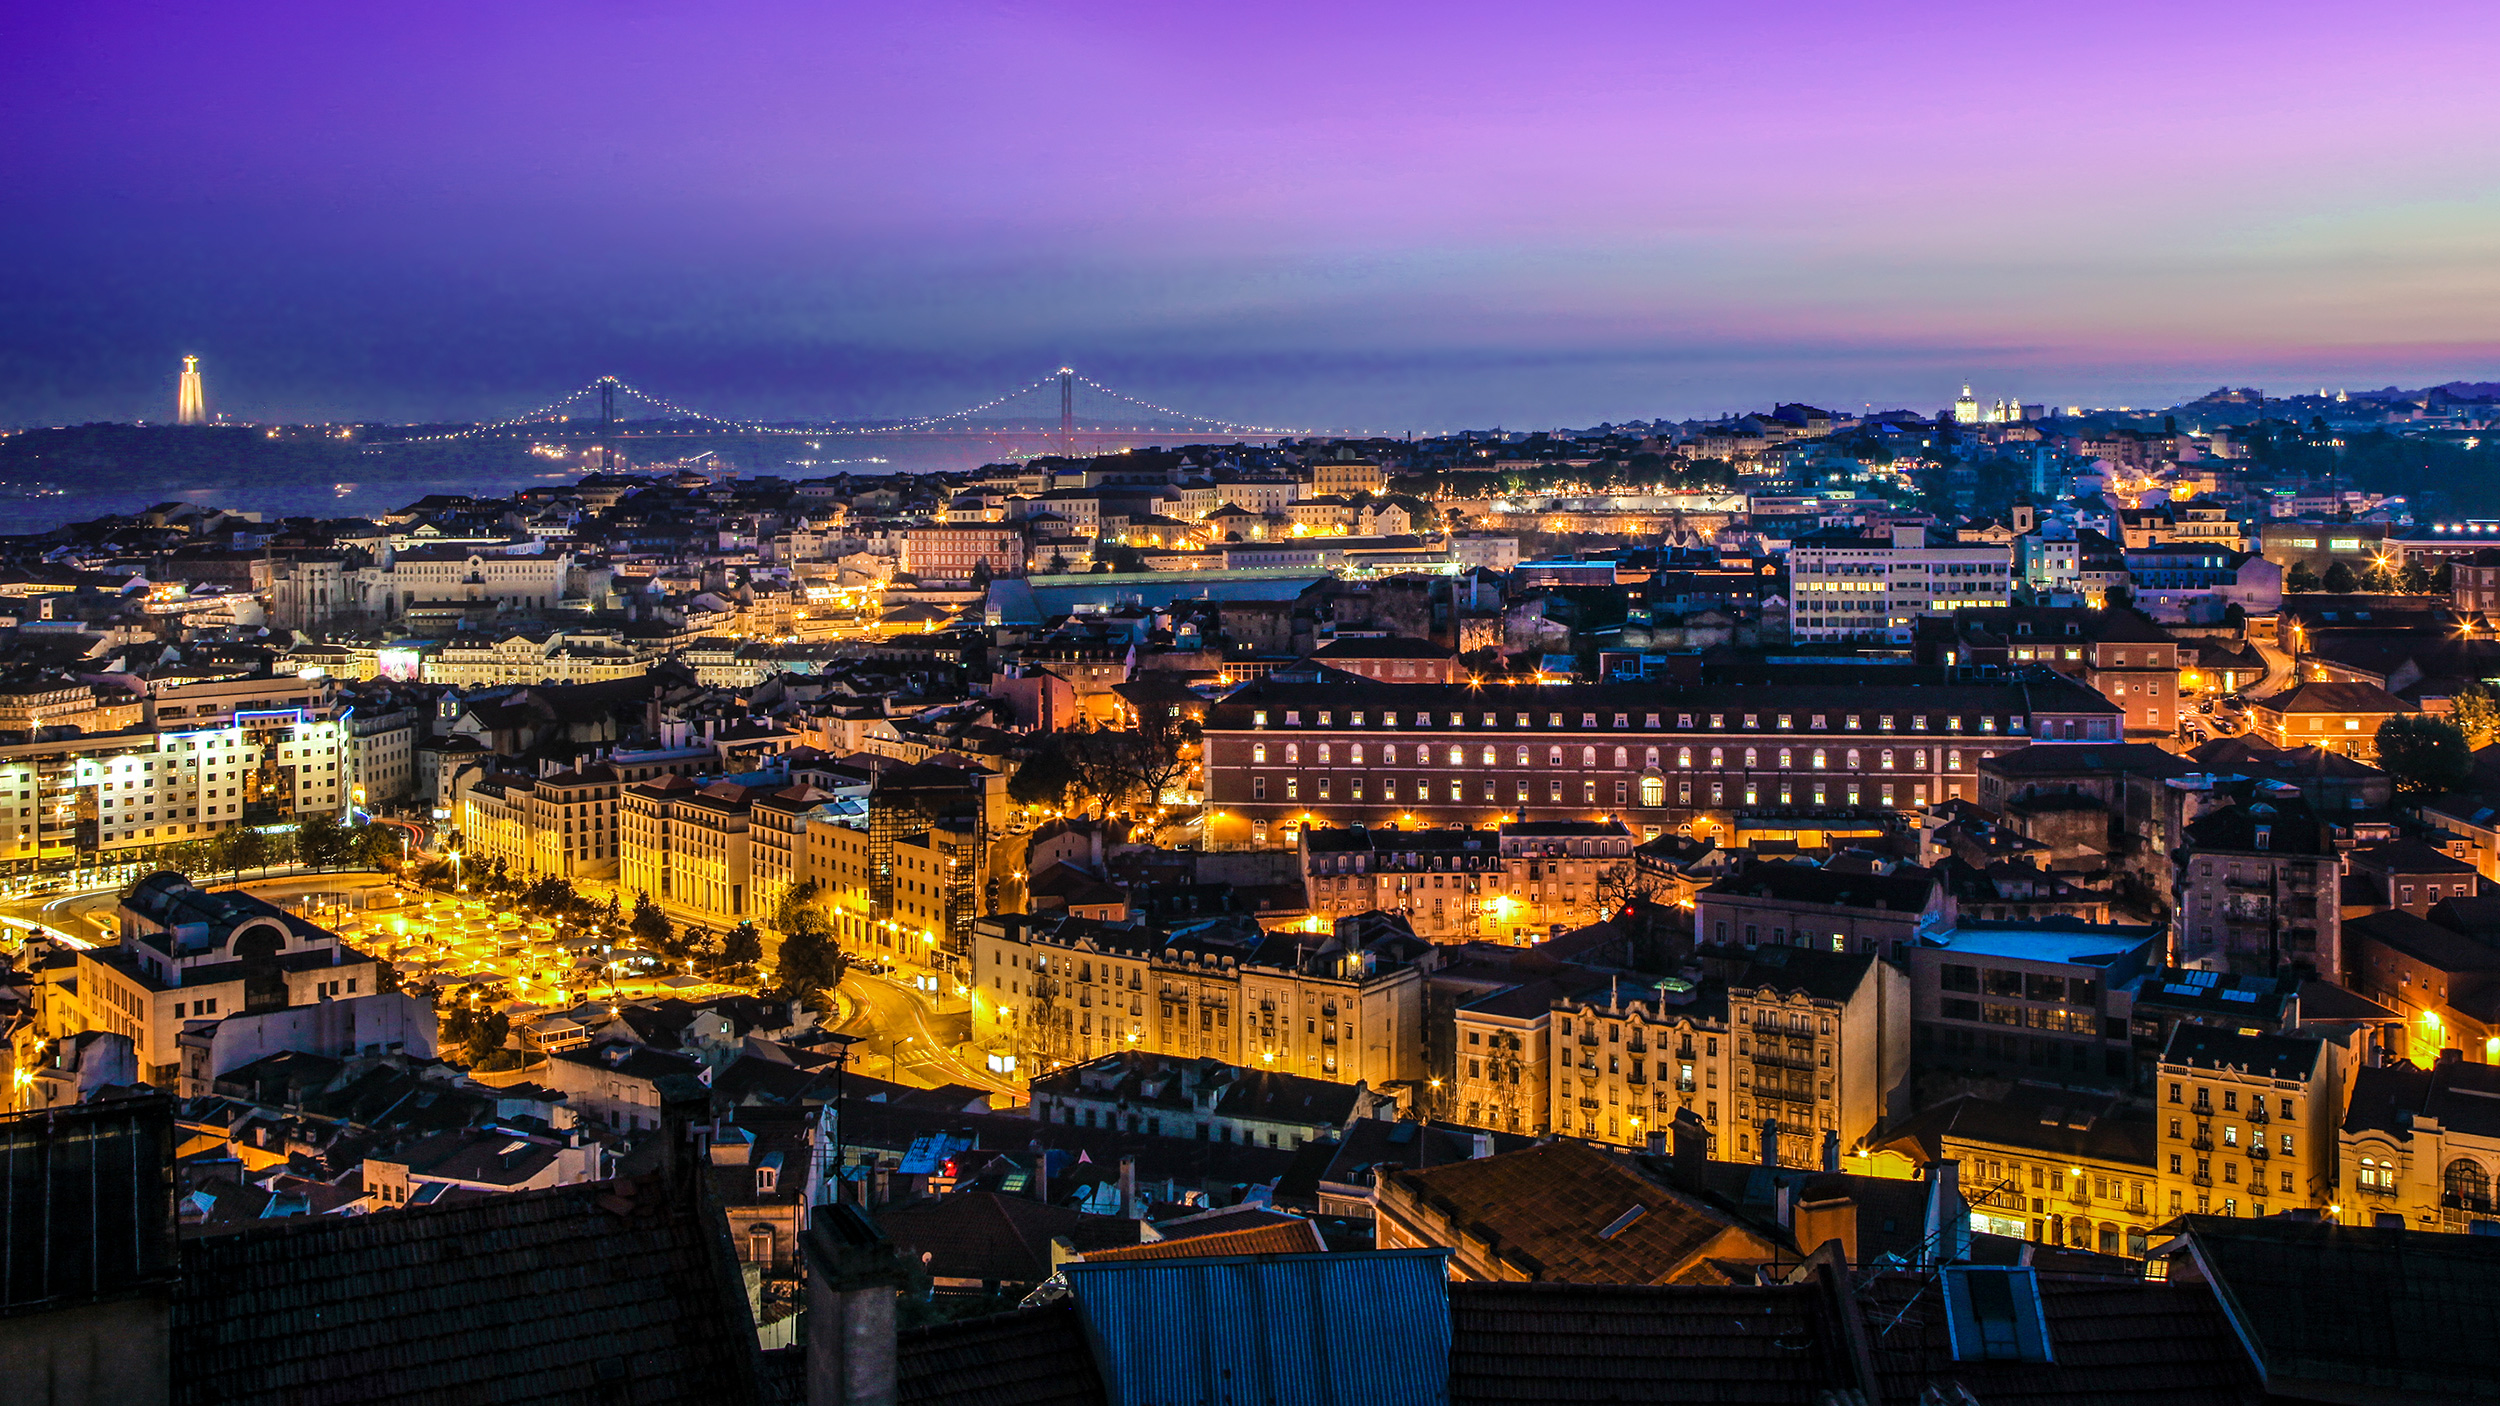 Destination: Lisbon